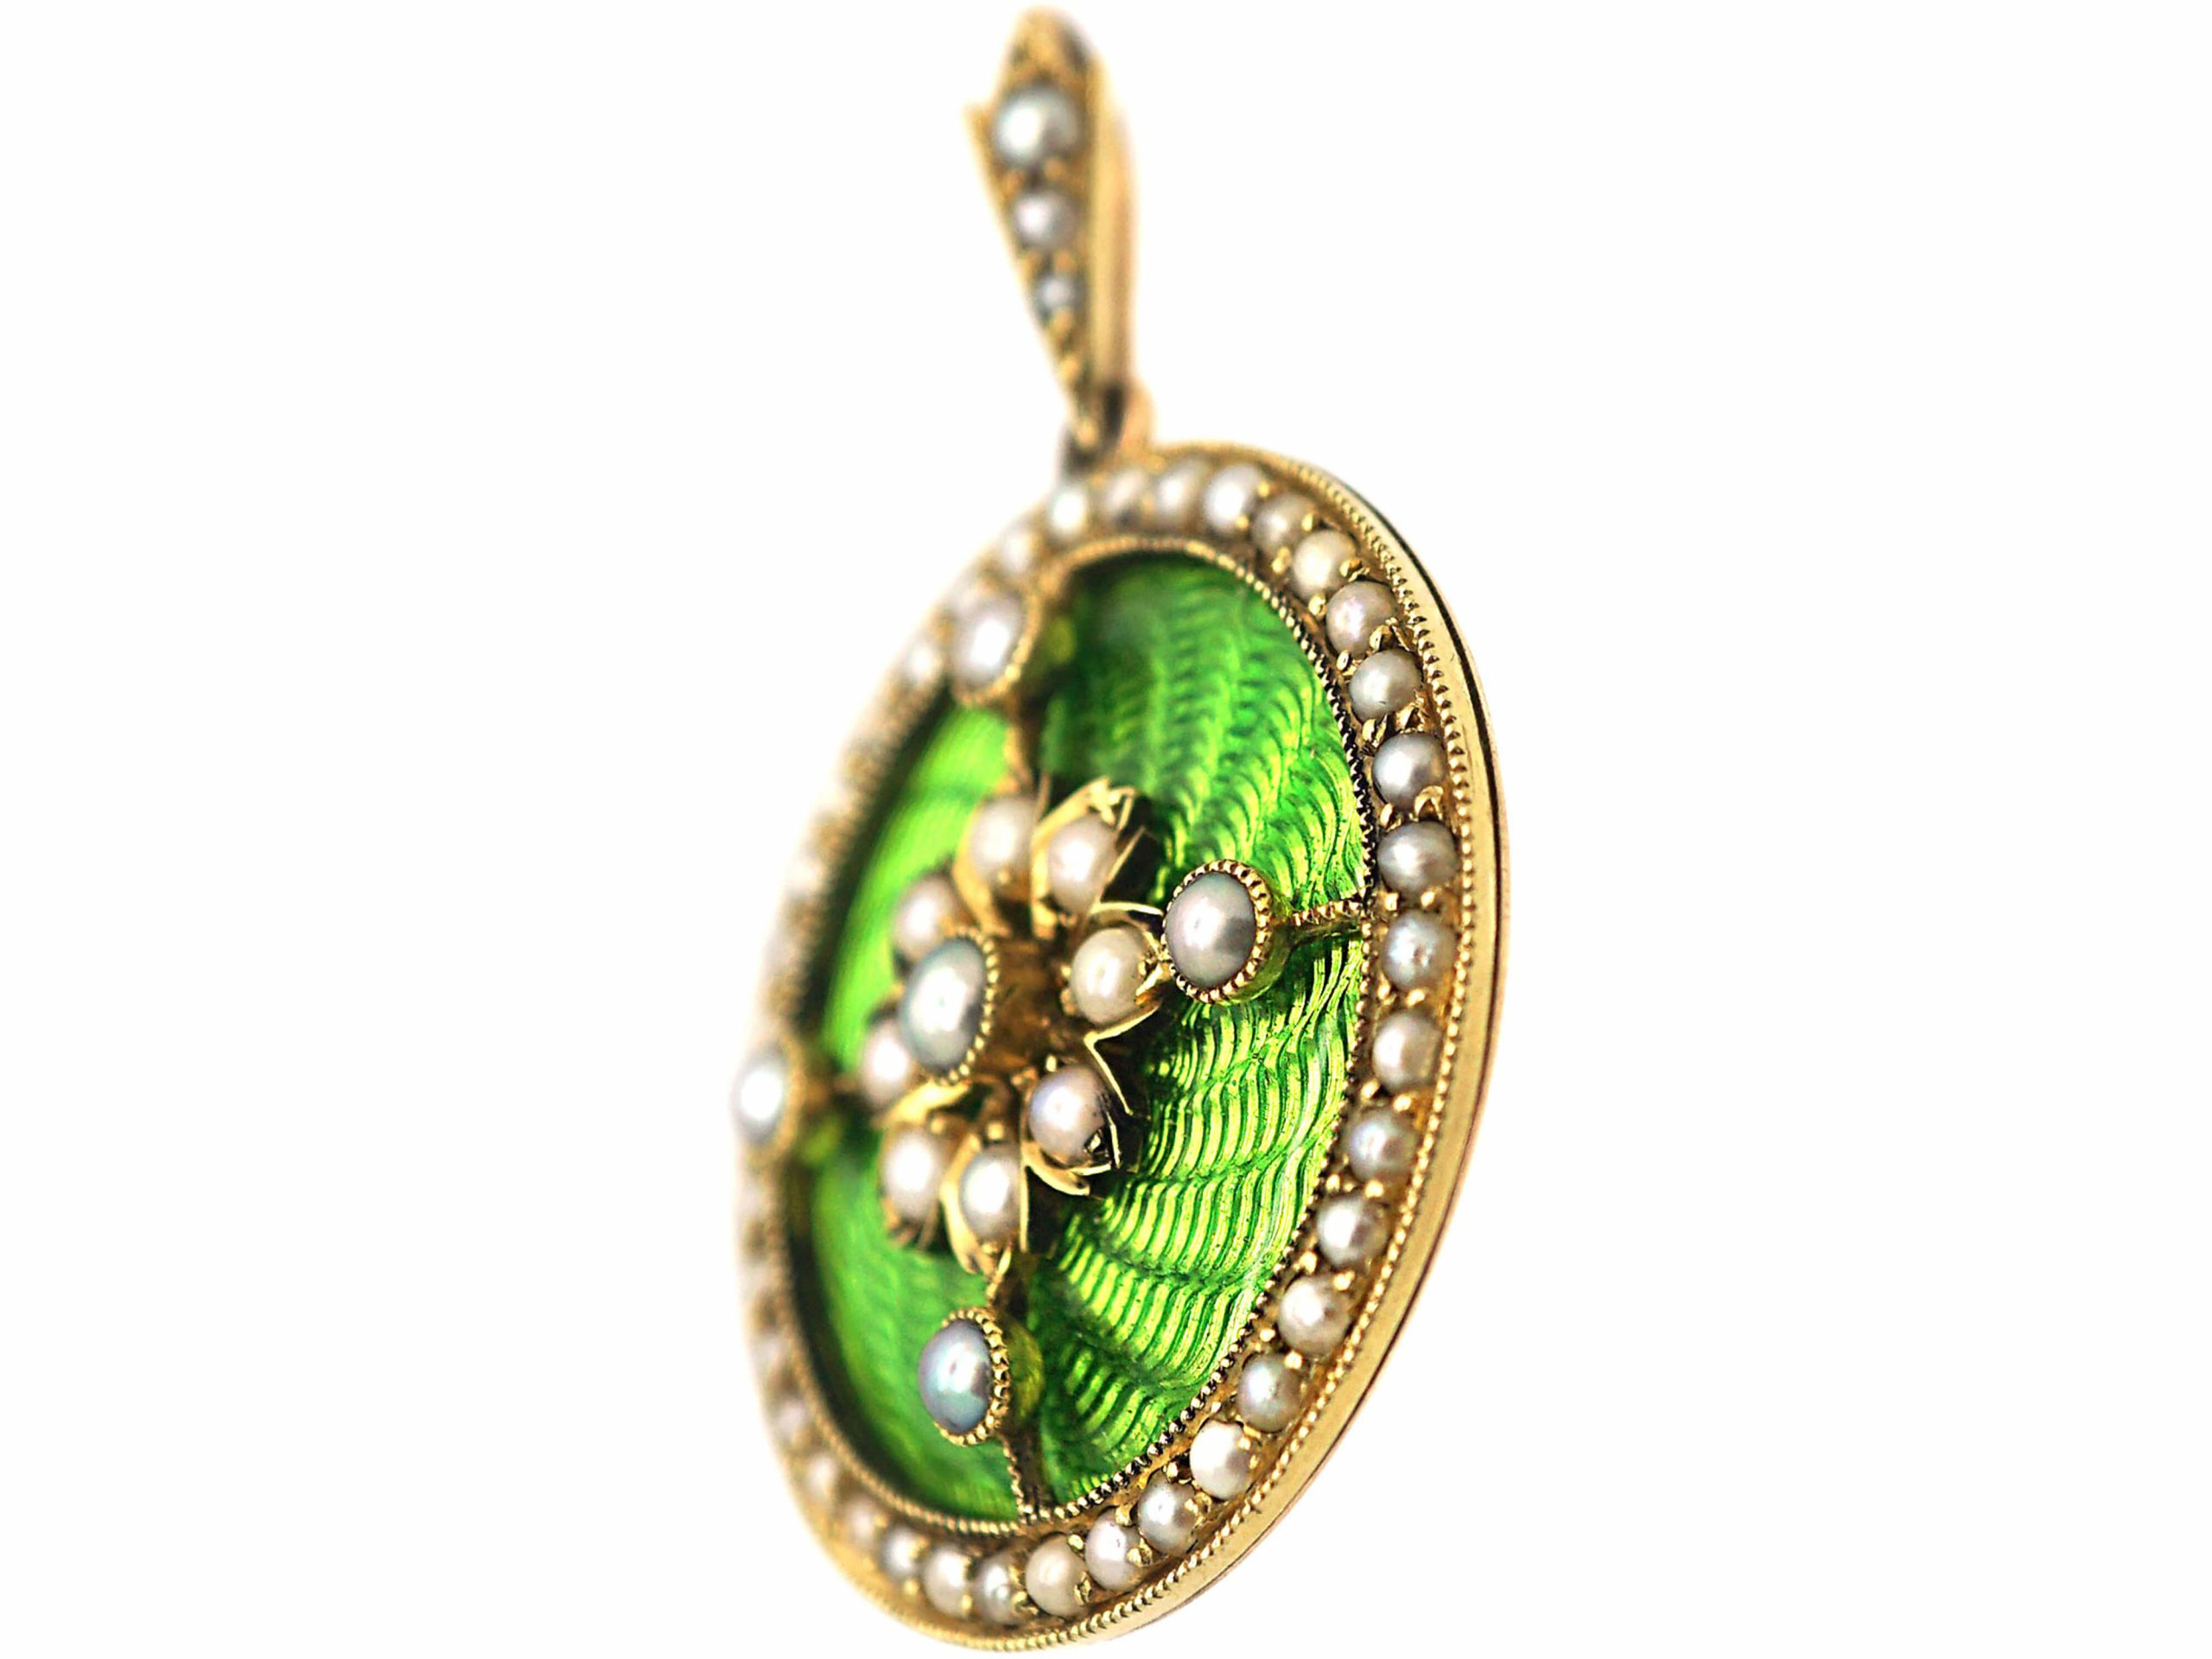 Edwardian 15ct Gold & Apple Green Enamel Round Pendant set with Natural Split Pearls